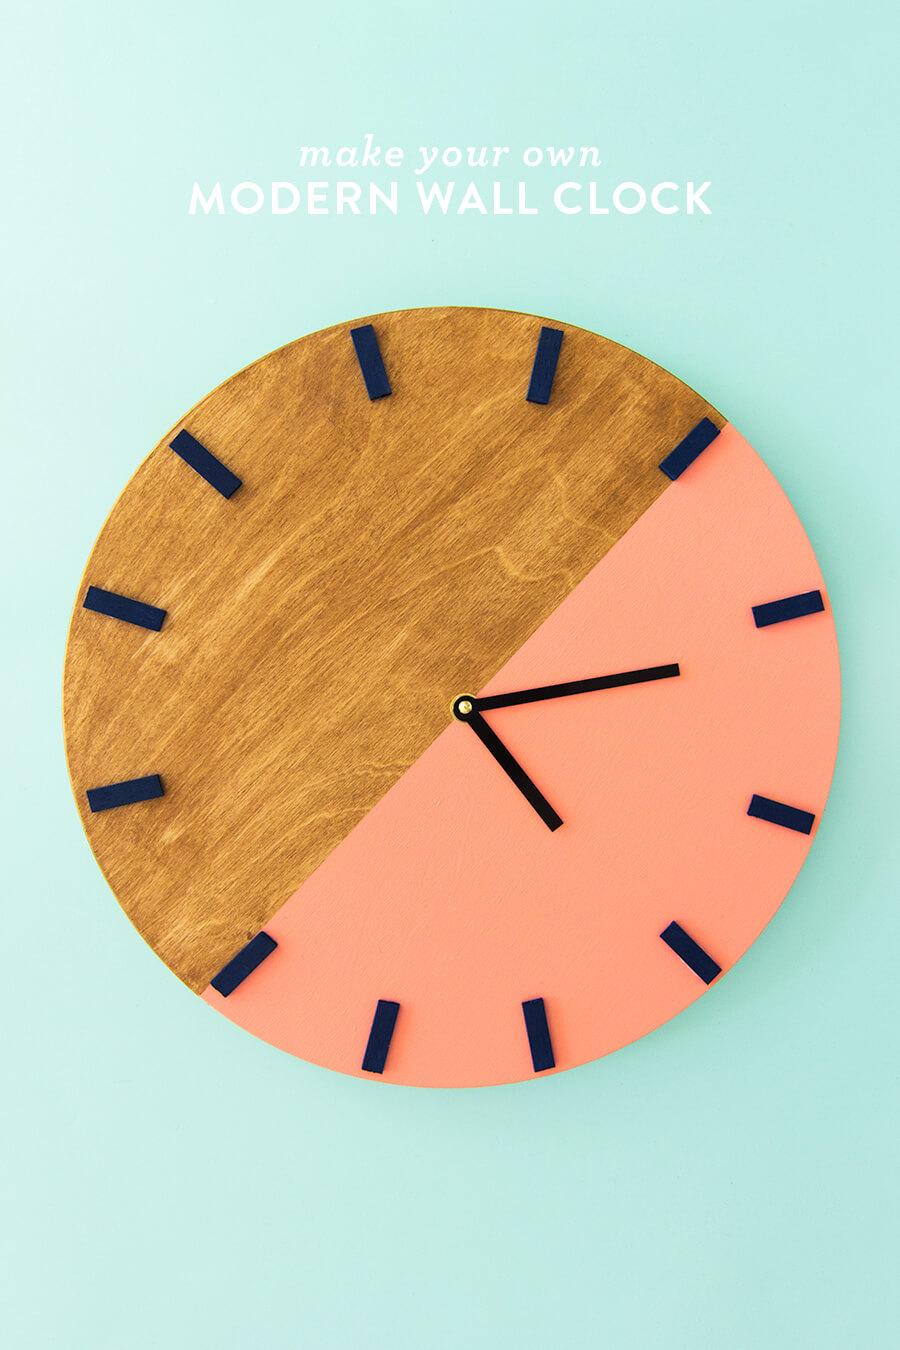 15 Wonderful DIY Wall Clock Projects You Will Enjoy Creating